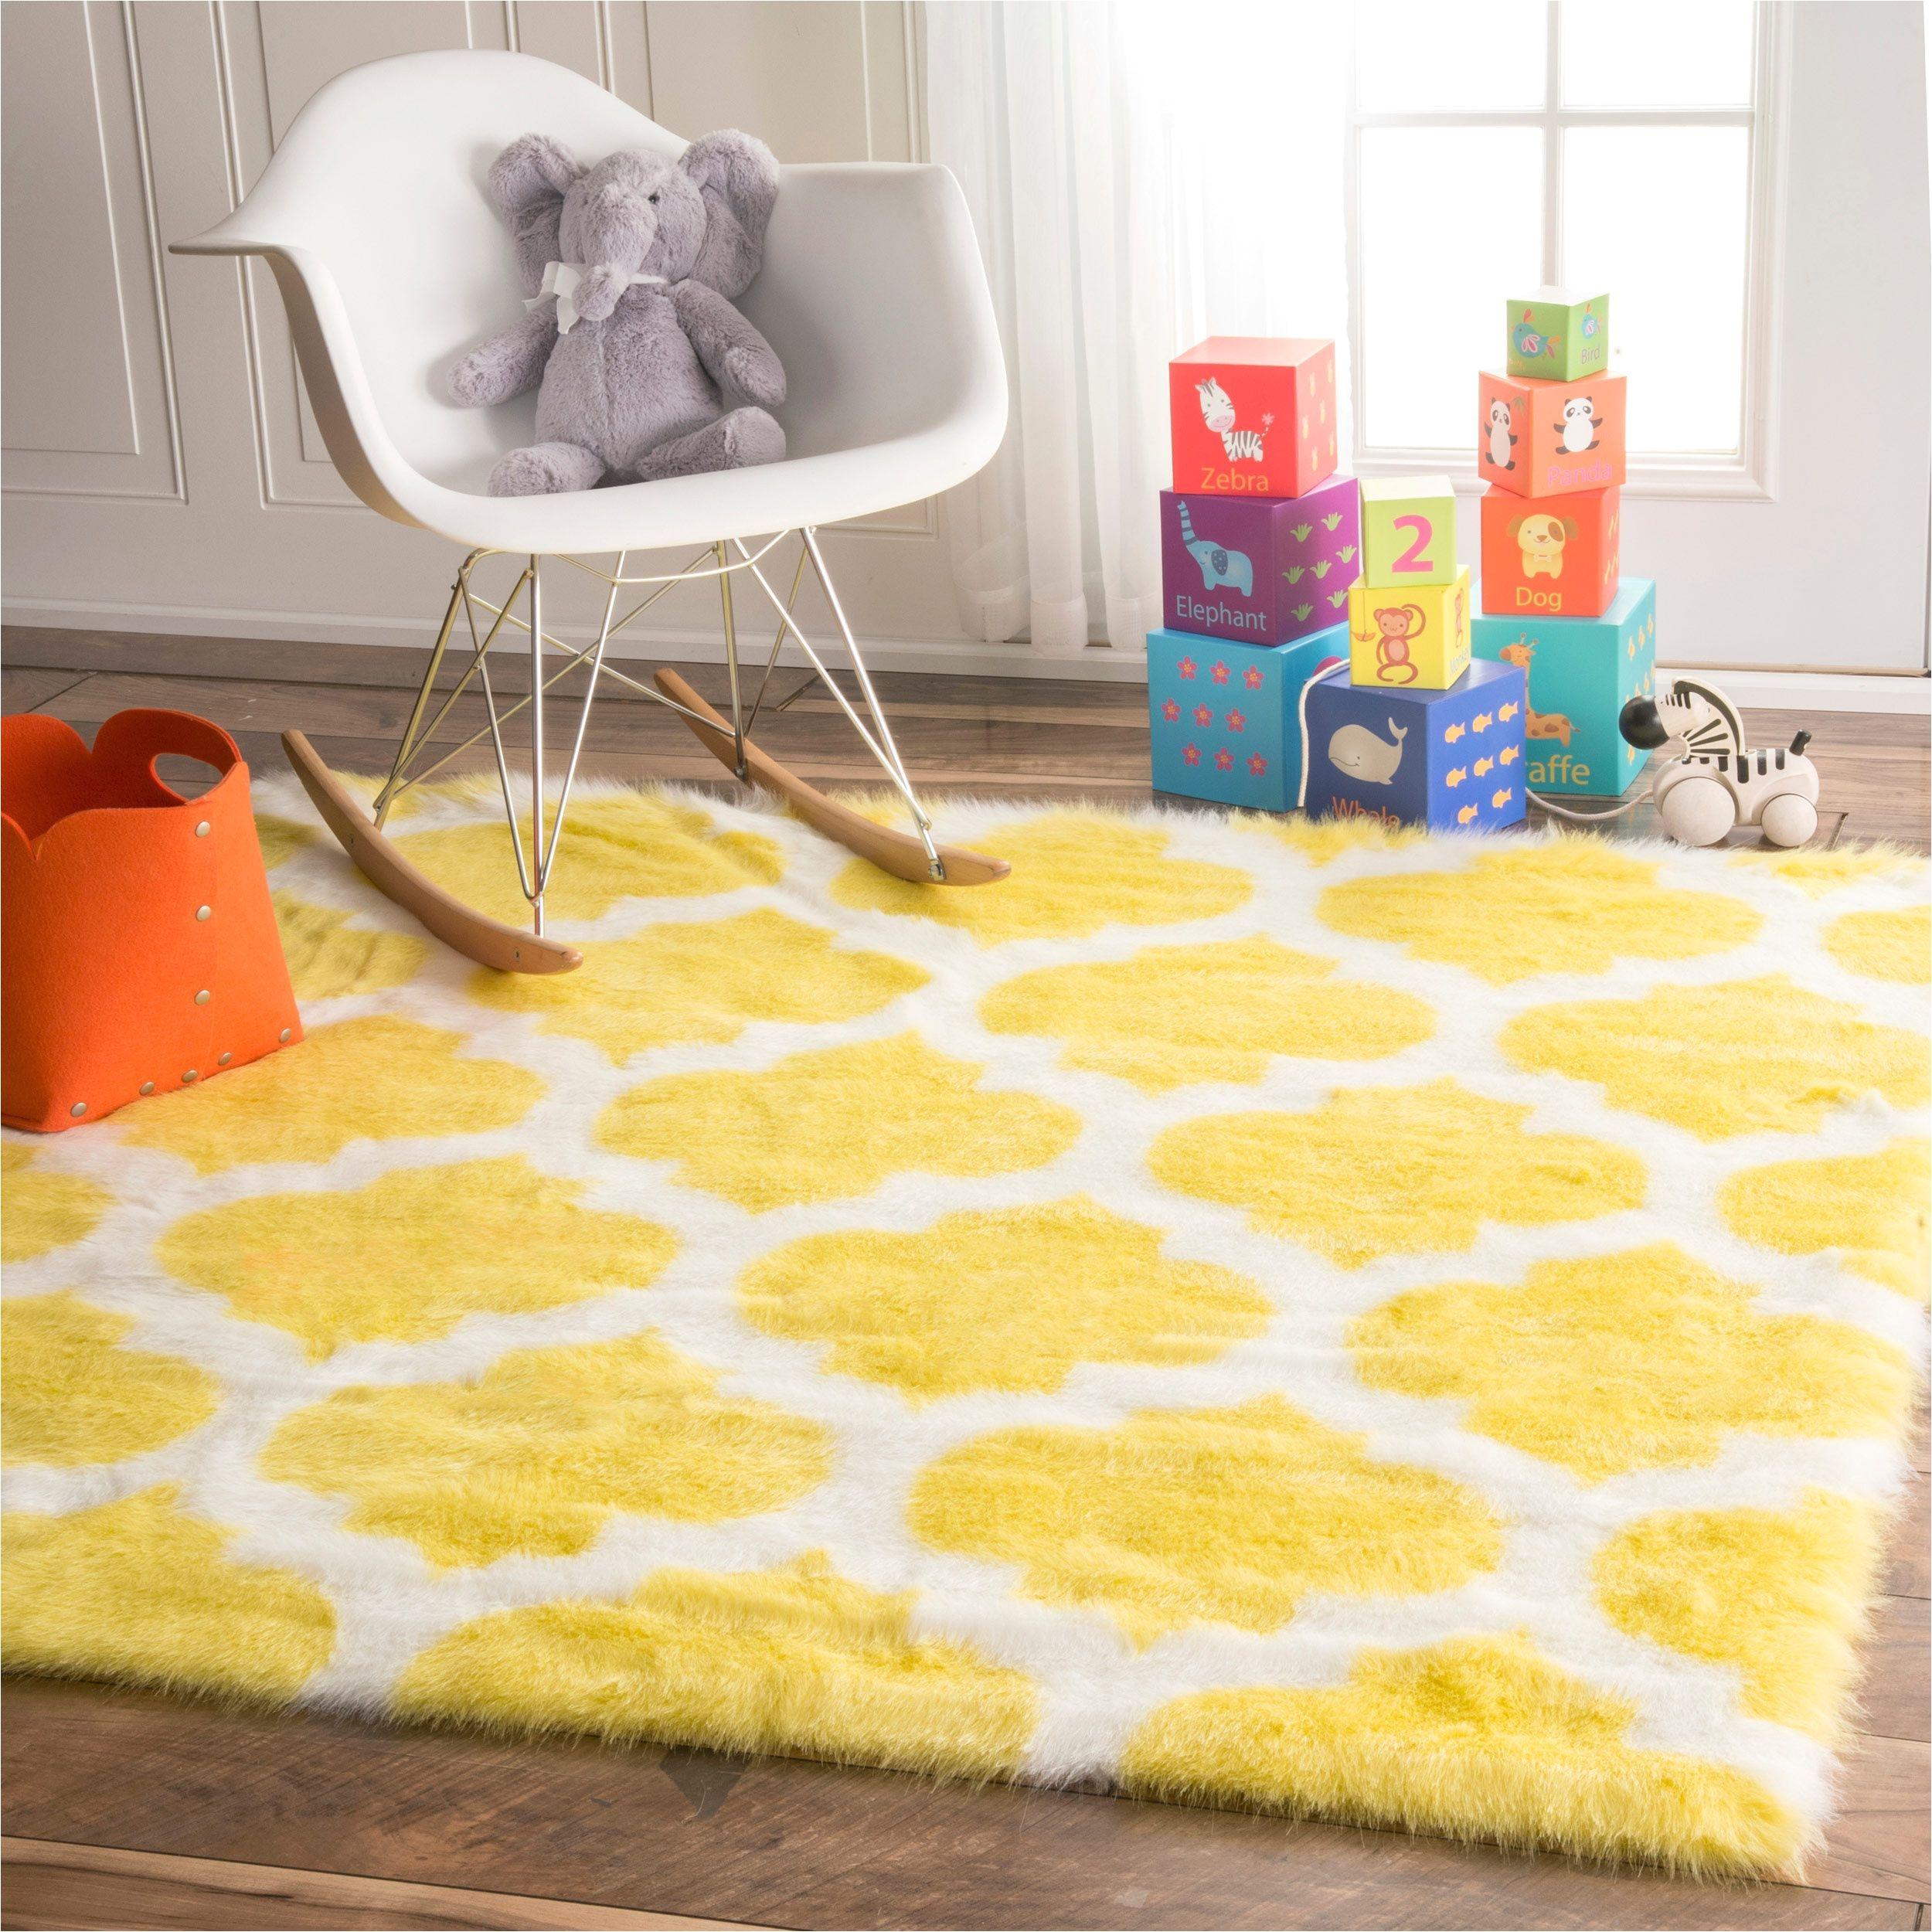 nuloom cozy soft and plush faux sheepskin tellis shag kids nursery yellow rug